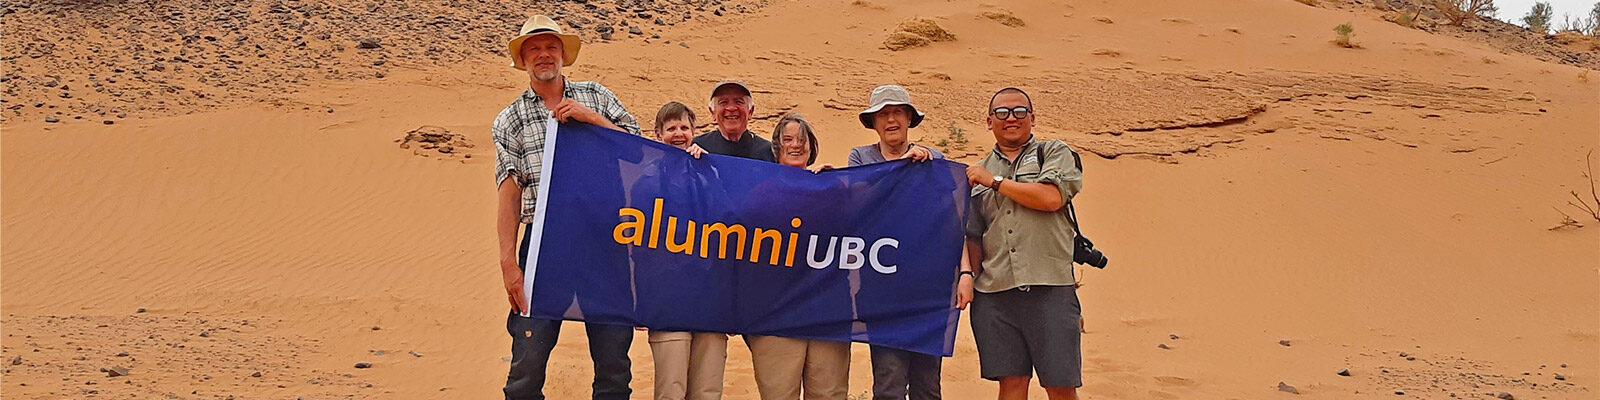 alumni UBC Travel Club